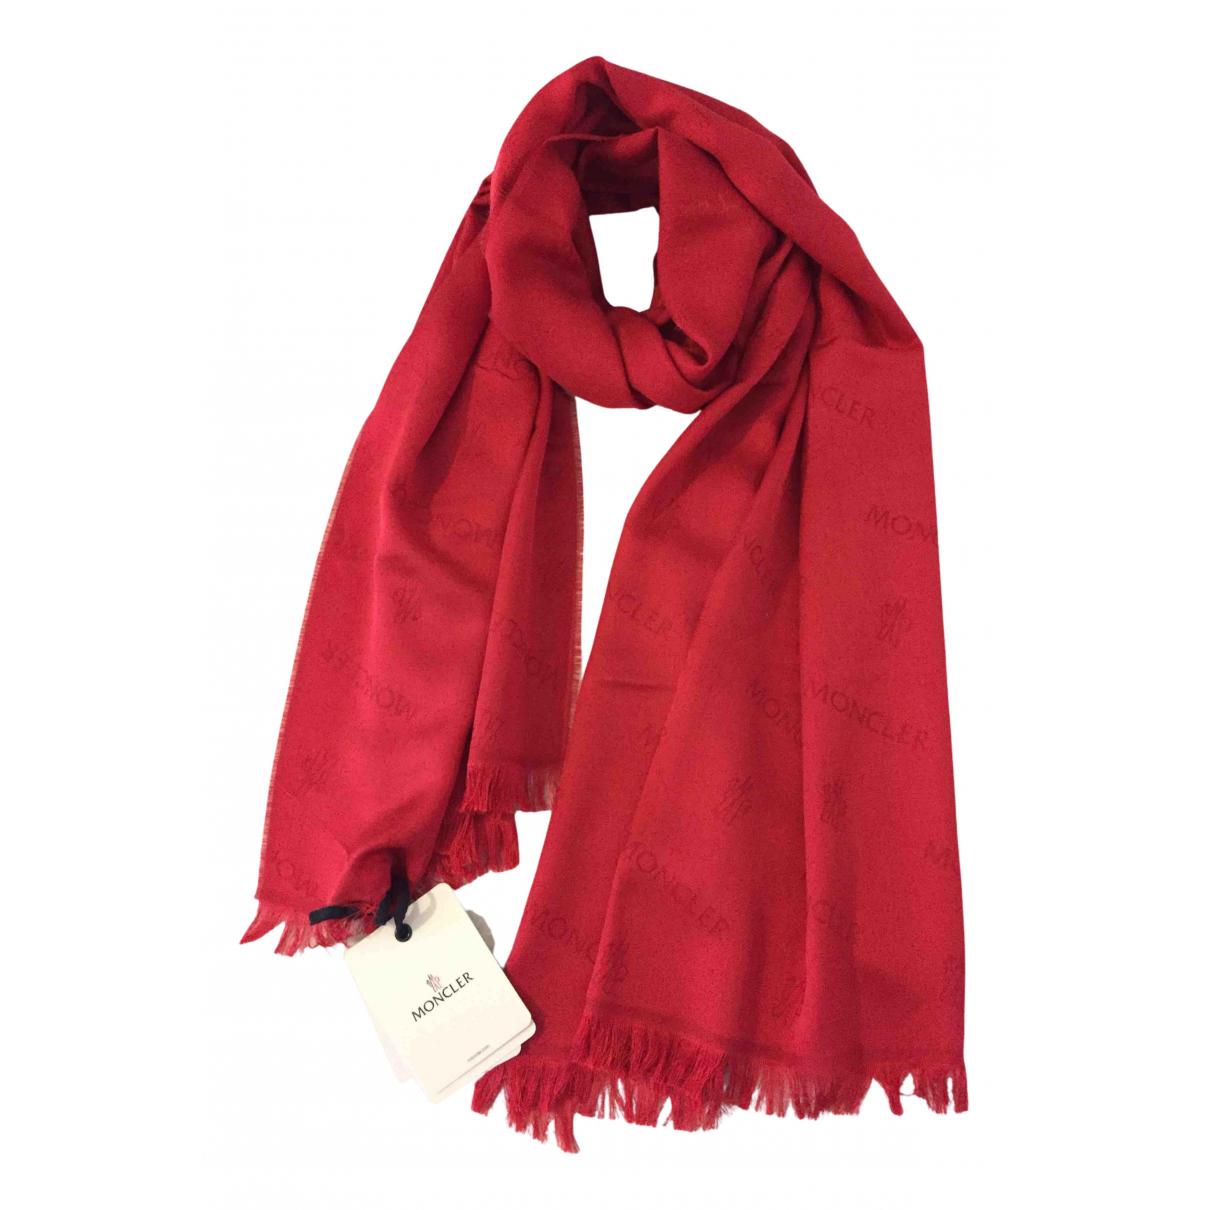 Moncler N Red Wool scarf for Women N